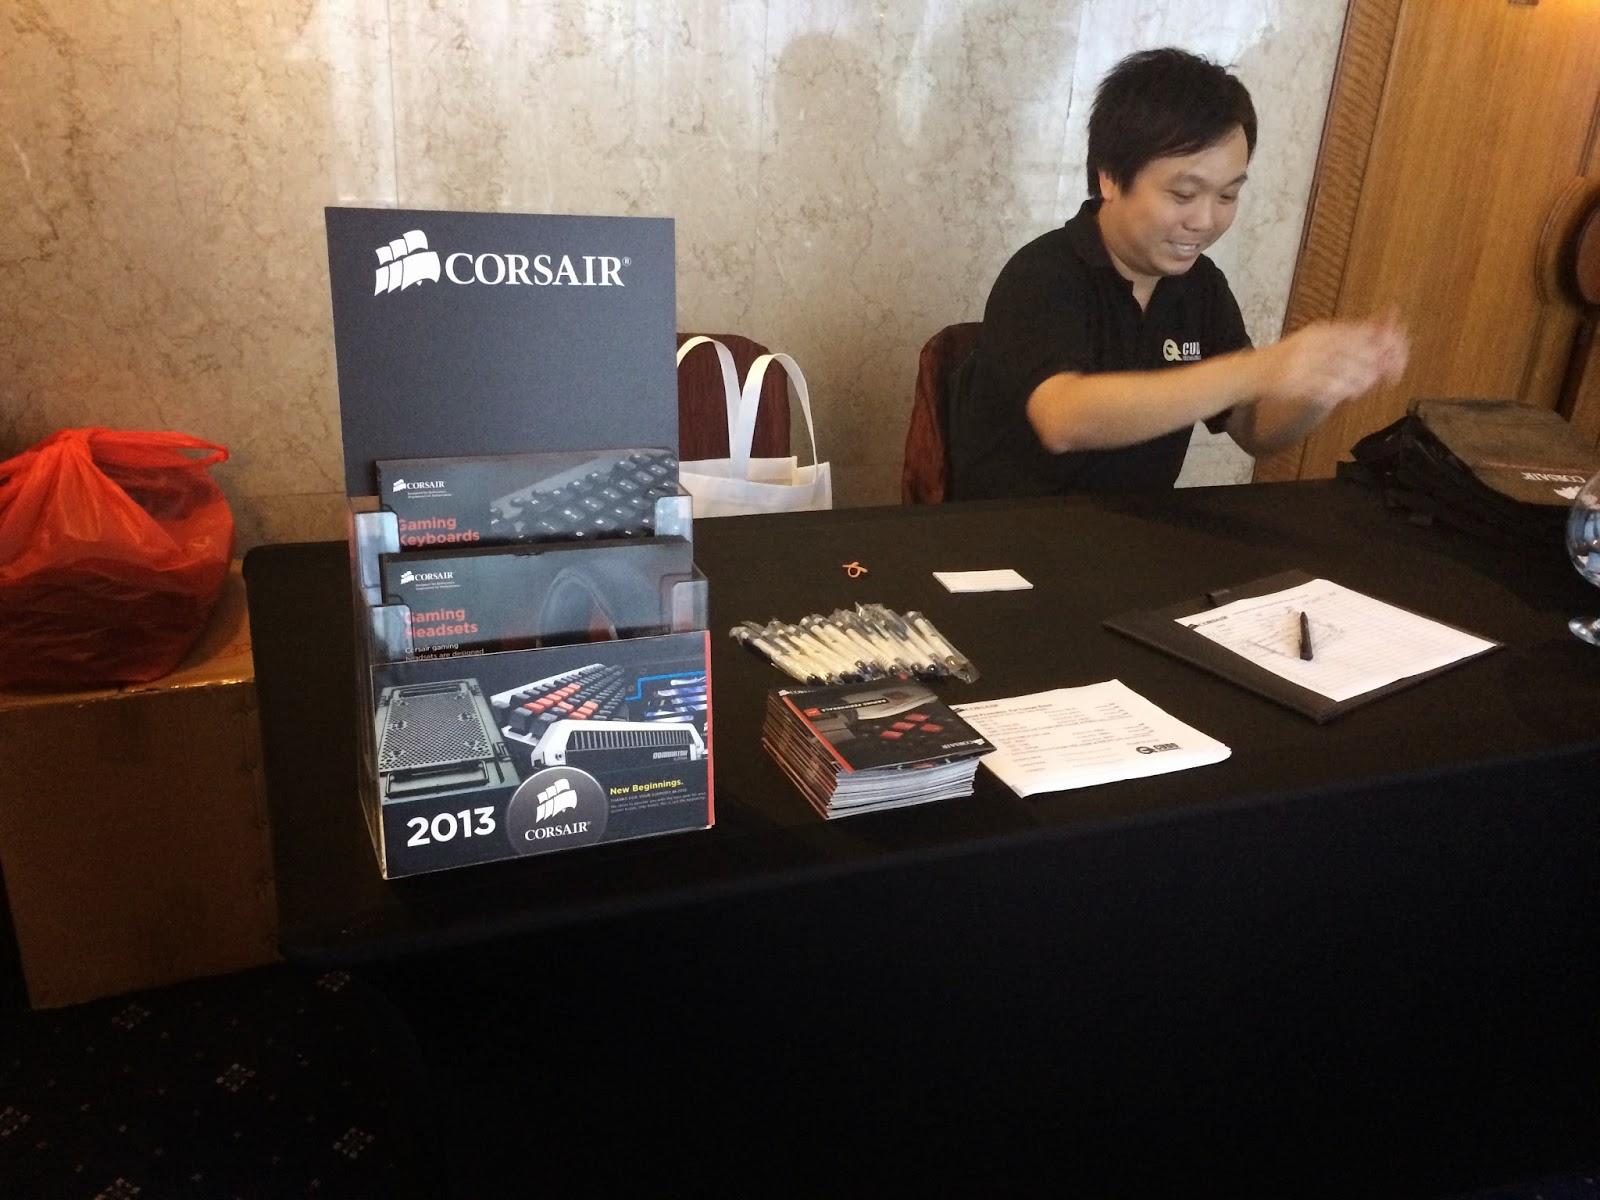 Coverage of Corsair Event @Melia Kuala Lumpur 2